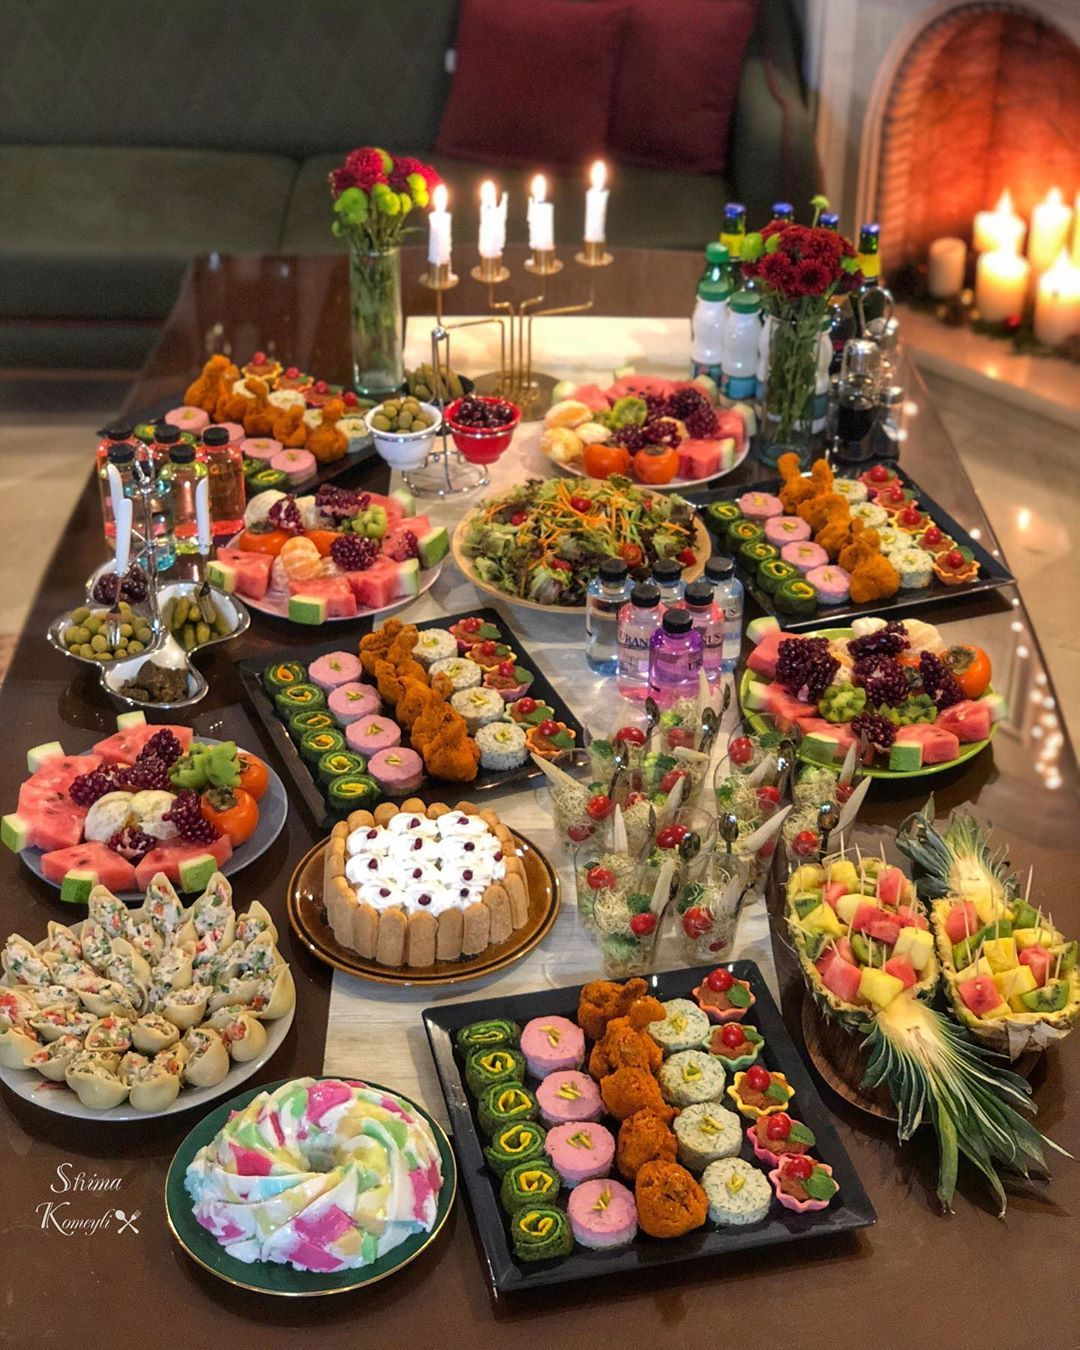 Shima Komeilyzade On Instagram سلام بروی ماه همه تون چقدر دلم برای معاشرت باهاتون تنگ شده بود این پستی که می بینید از میز شام تولد ه Yummy Food Food Yummy